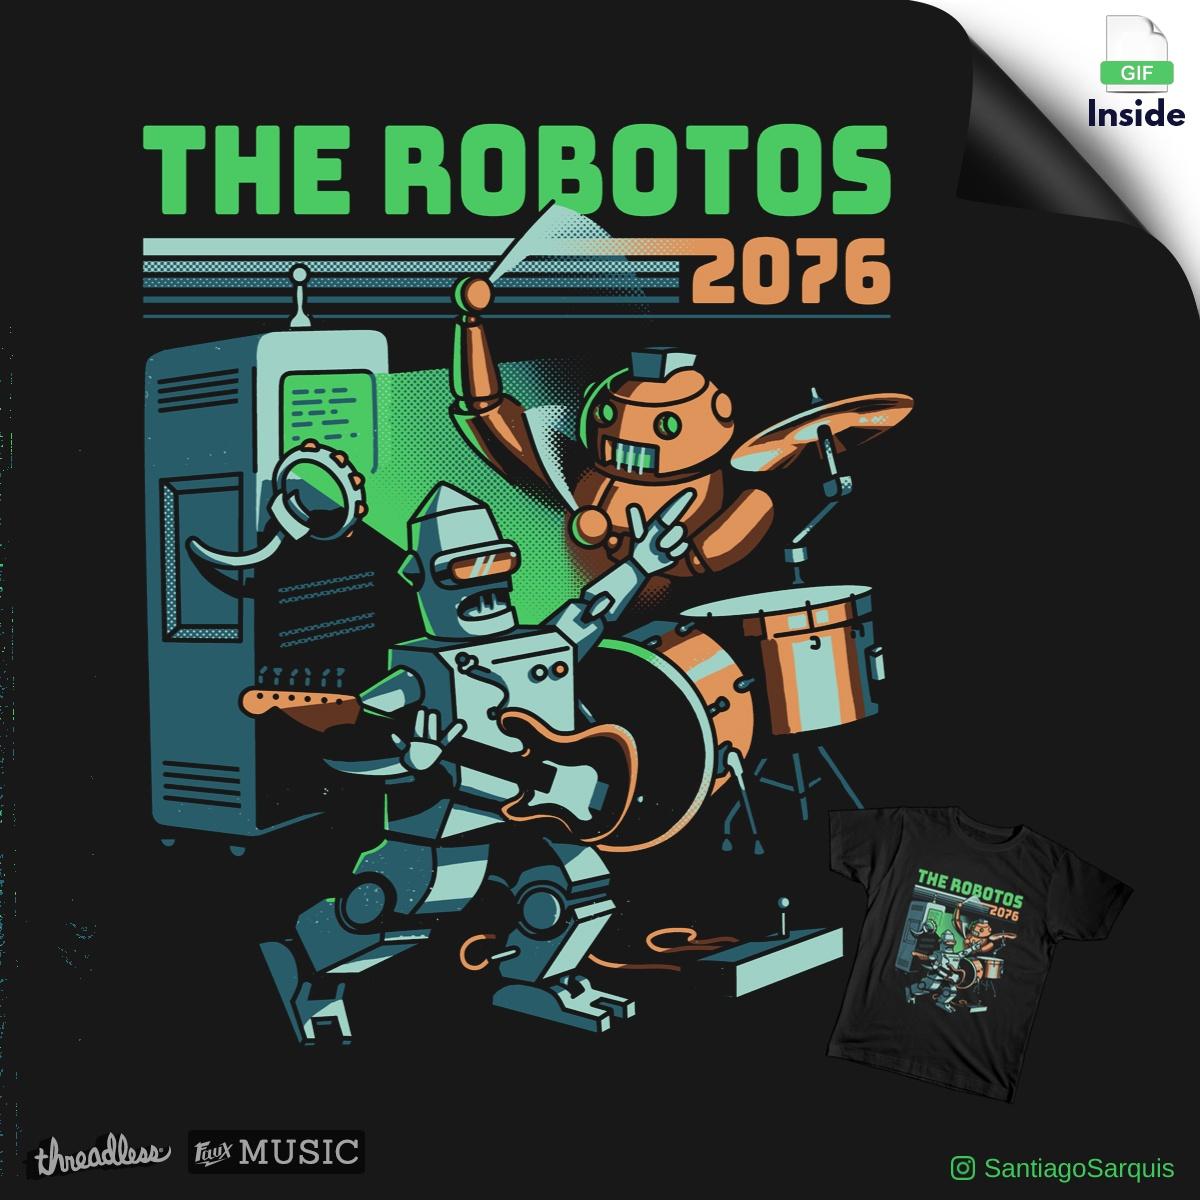 The Robotos by metalsan on Threadless